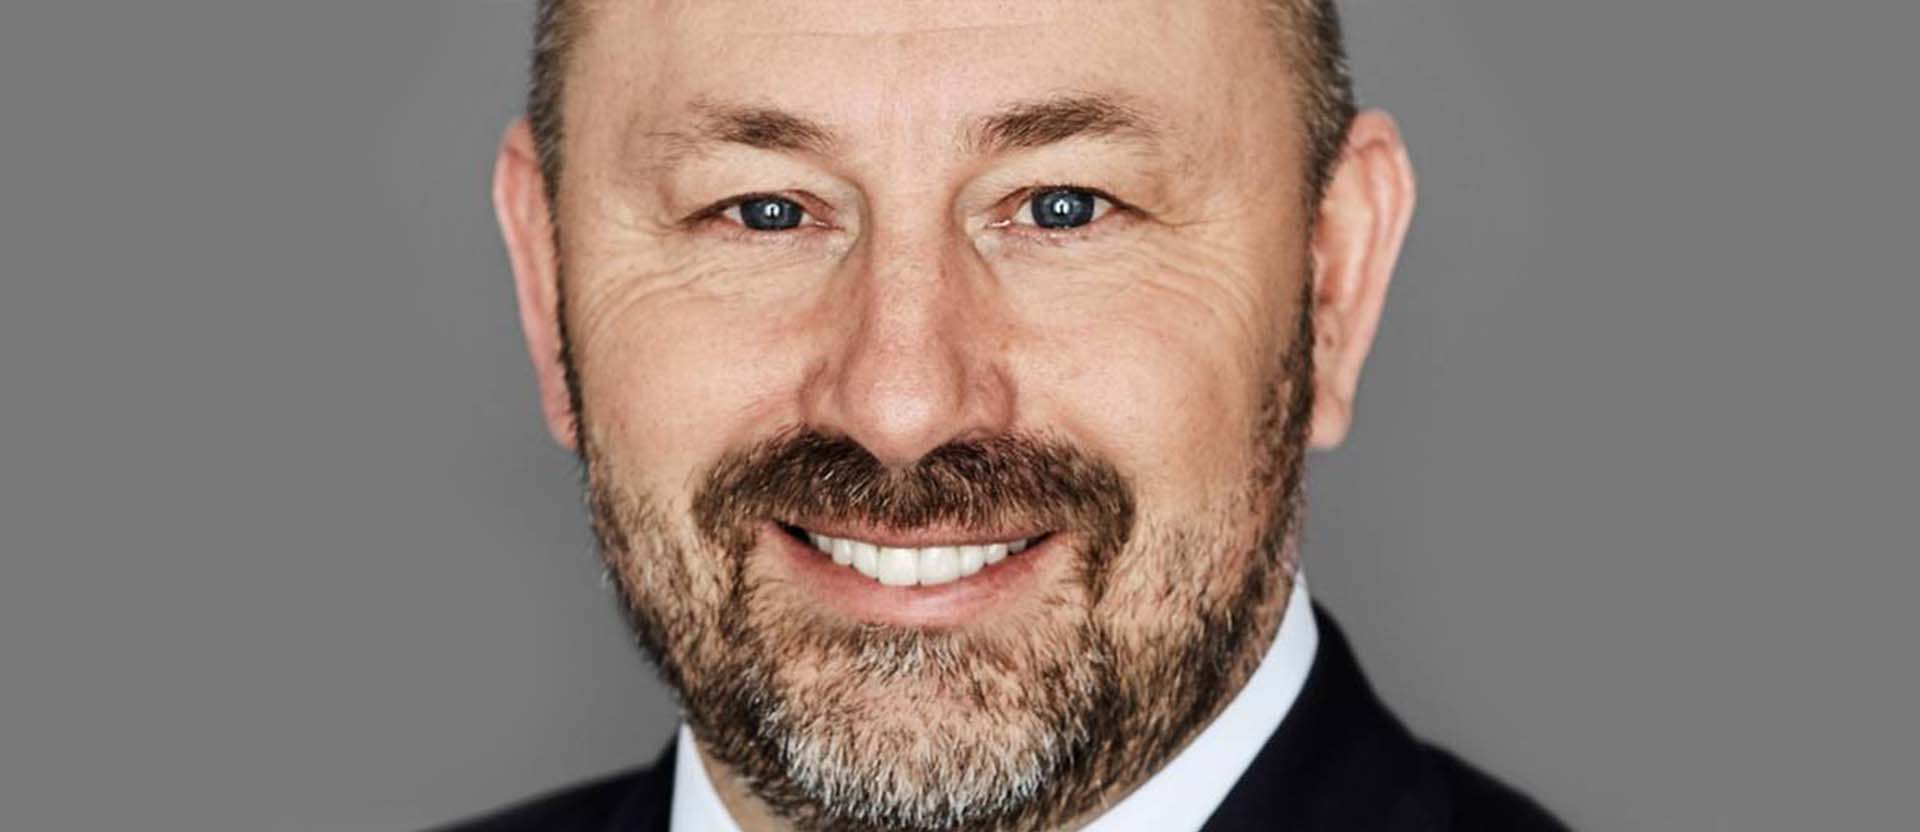 Norcod, investor asset manager Artha